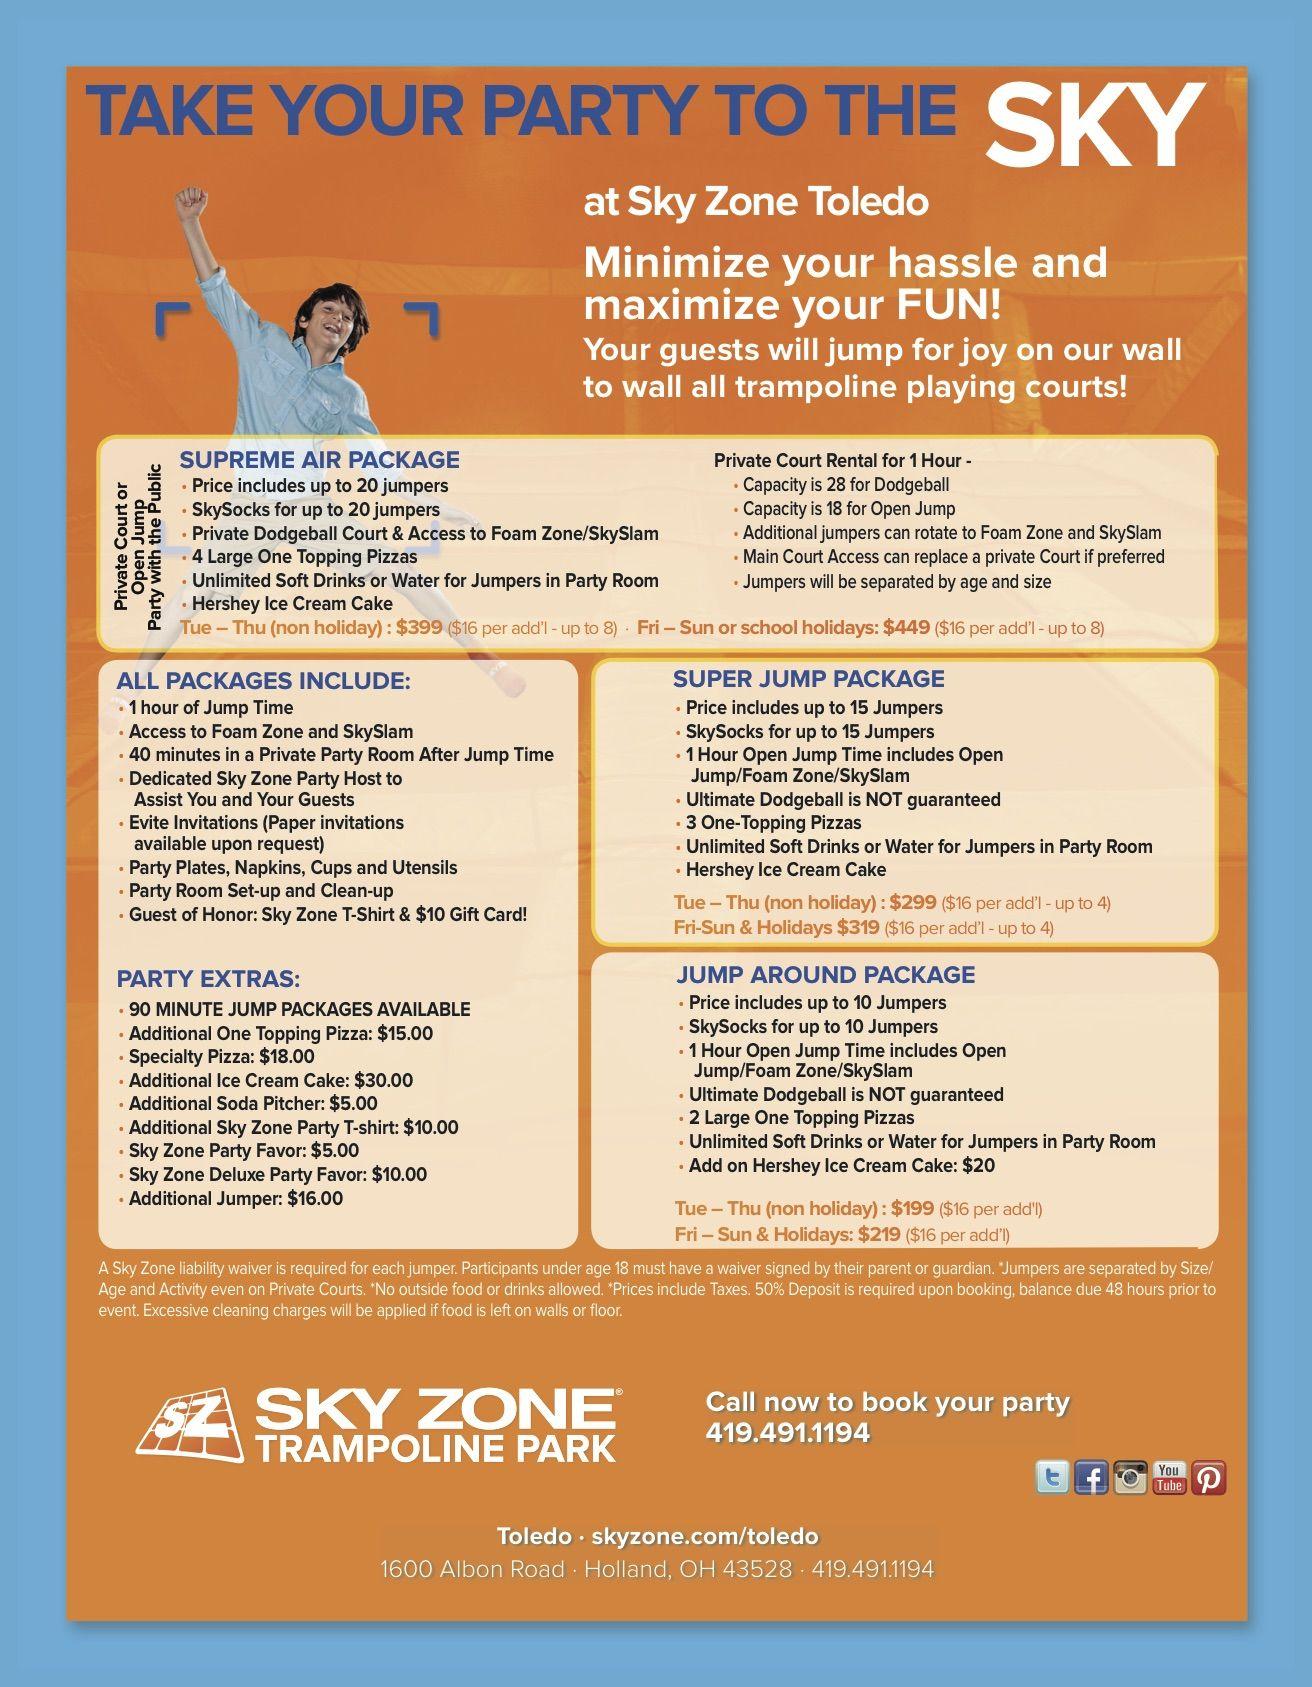 Sky Zone Trampoline Park Toledo Birthday Parties Good Idea